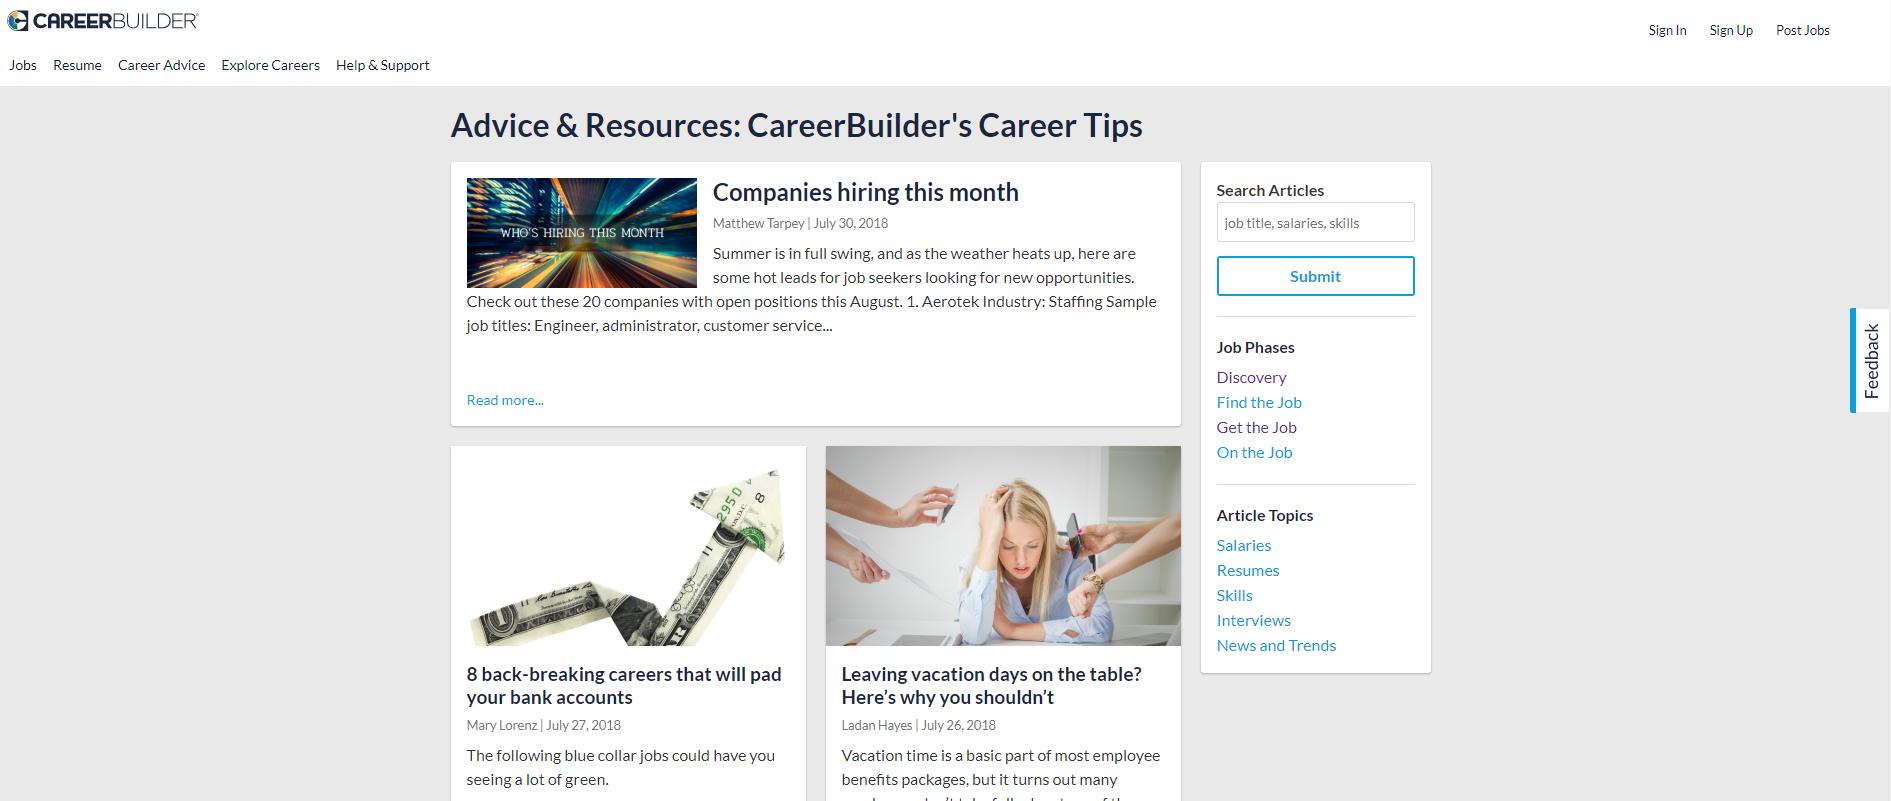 job search advice career builder